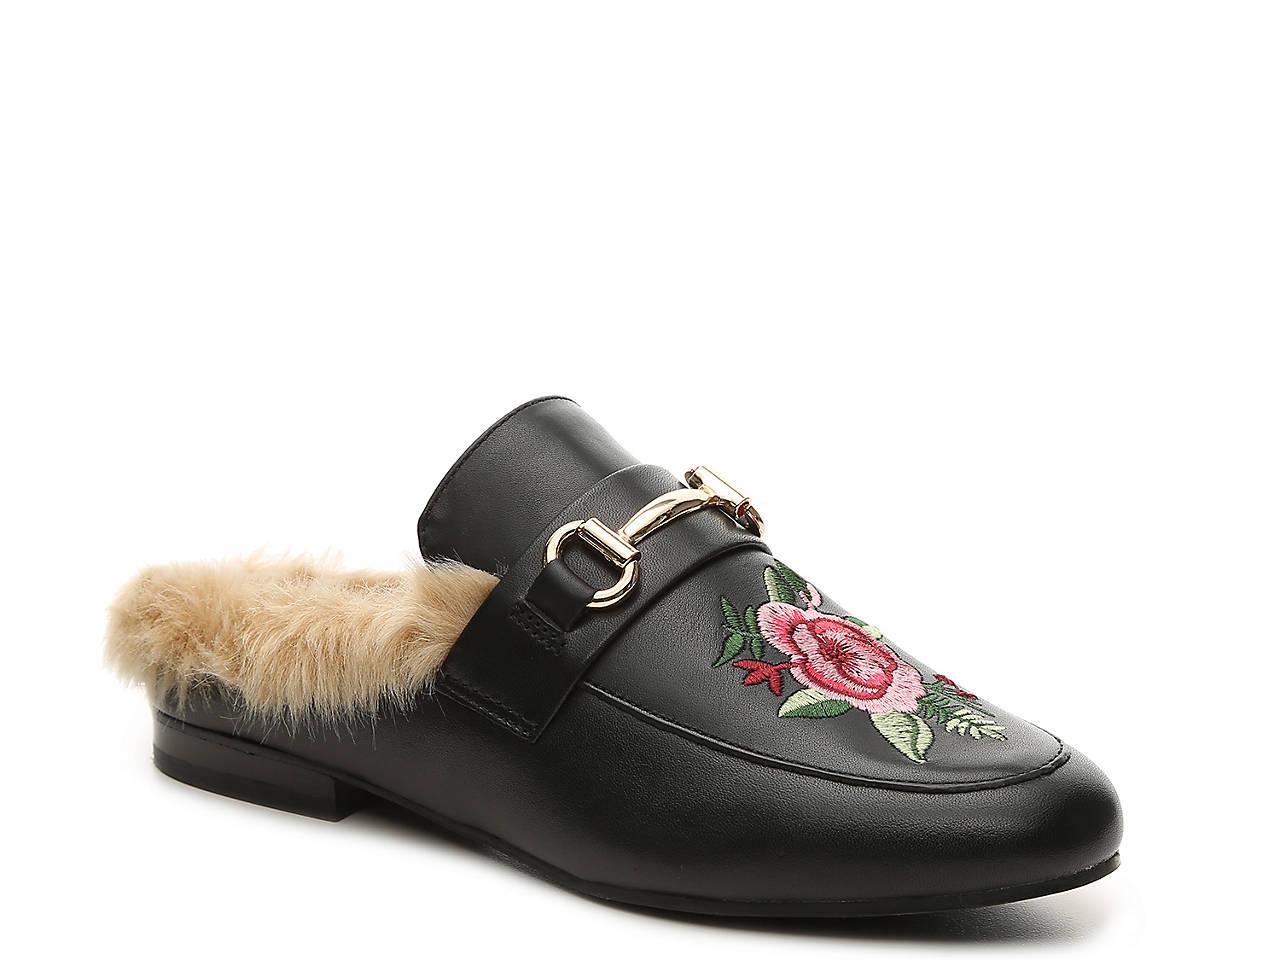 a27f19ff655 Steve Madden Jill Mule Women s Shoes